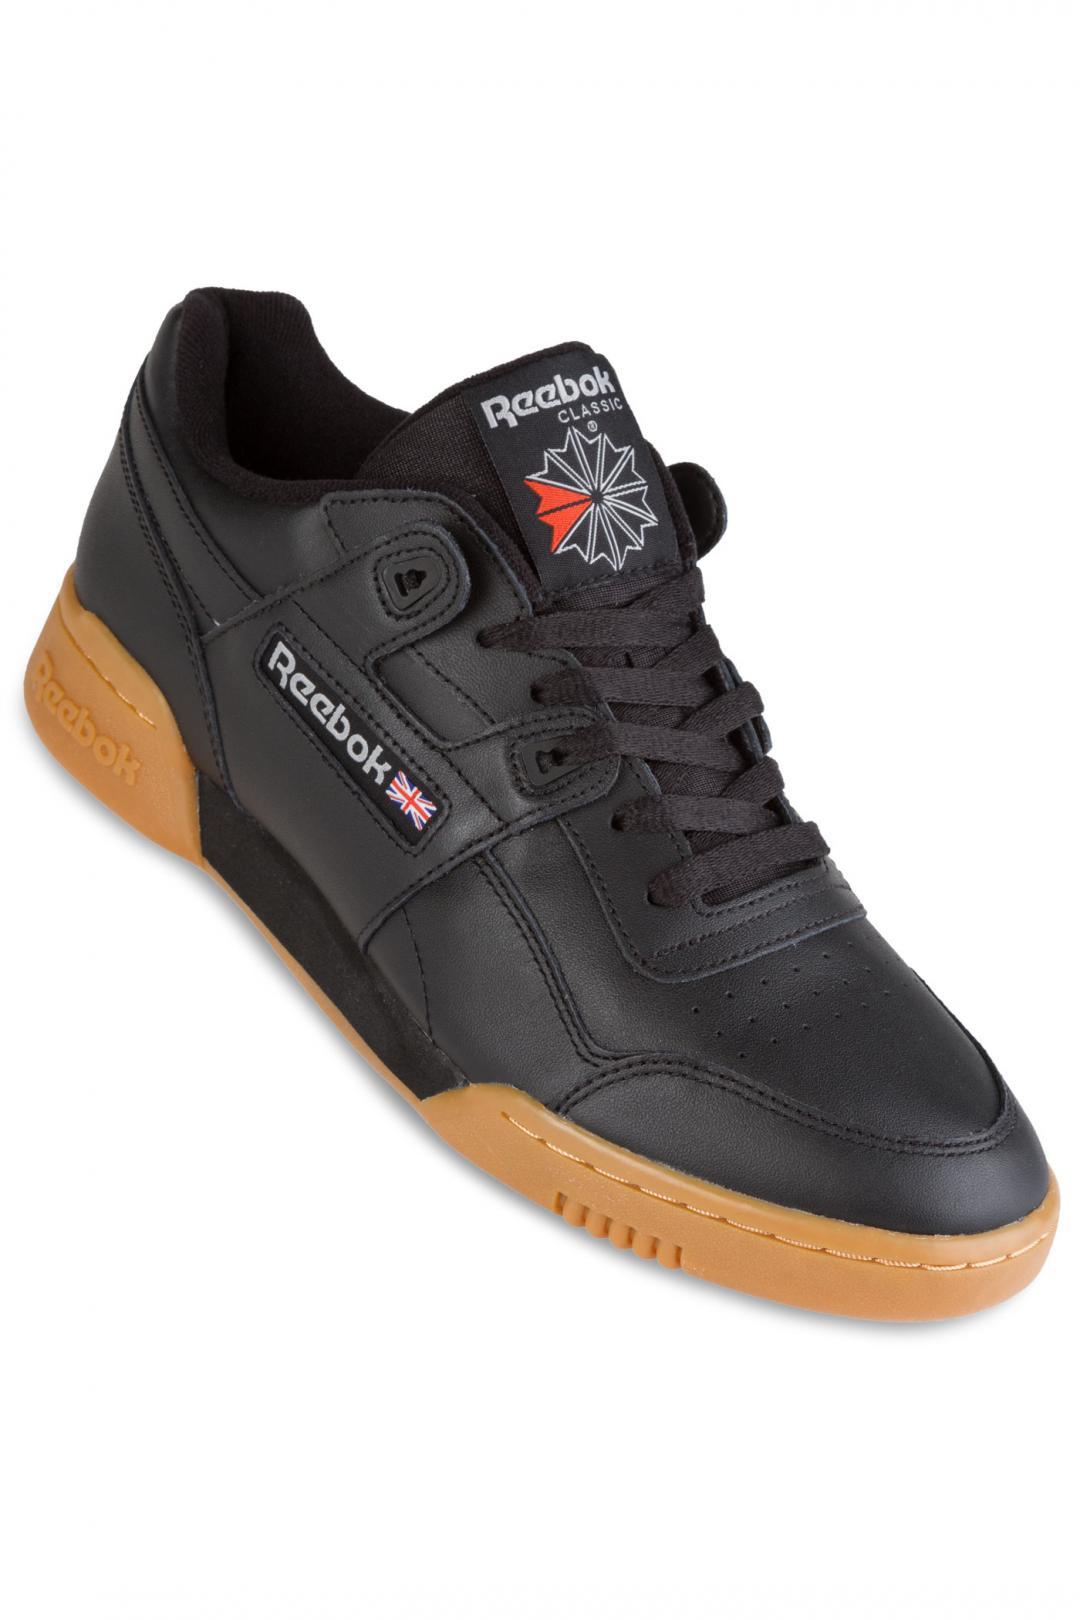 Uomo Reebok Workout Plus black carbon classic red | Scarpe da skate